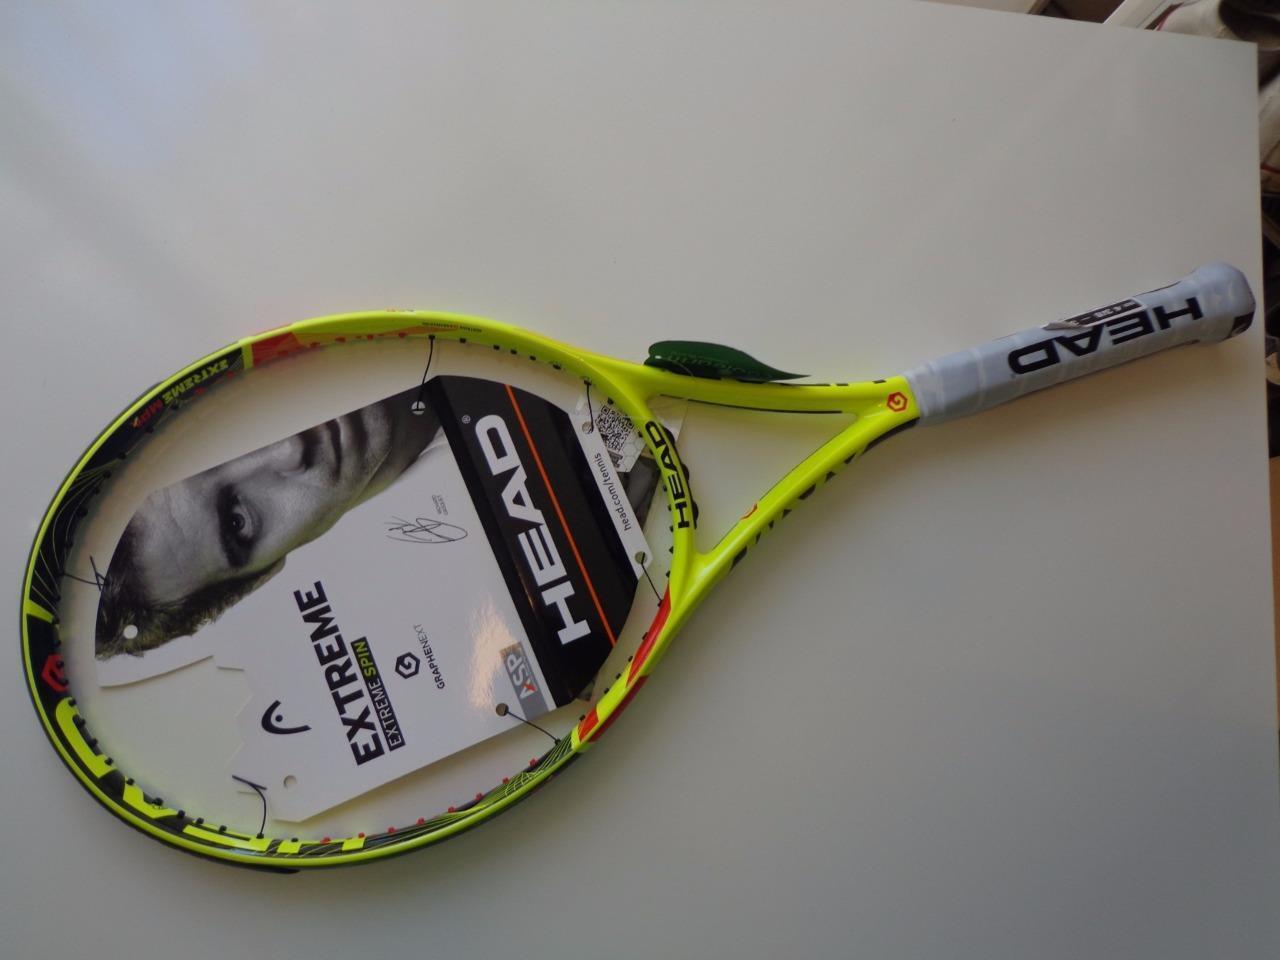 Nuevo Head Graphene Xt Extreme MPA 100 cabeza 4 3 8 Grip Tenis Raqueta